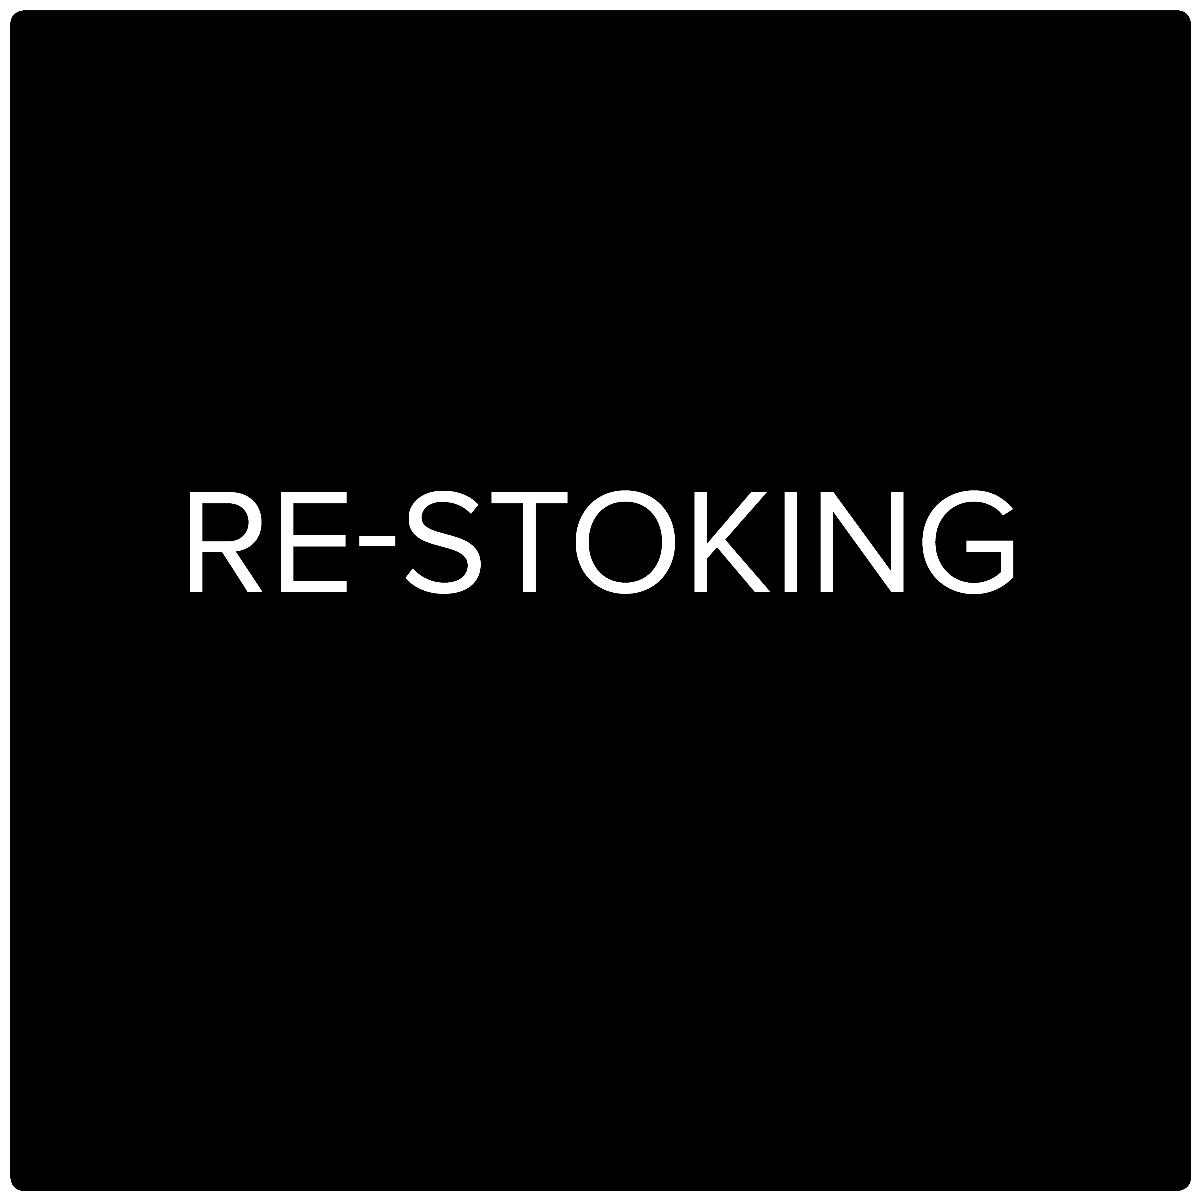 HWAM Video: Re-stoking